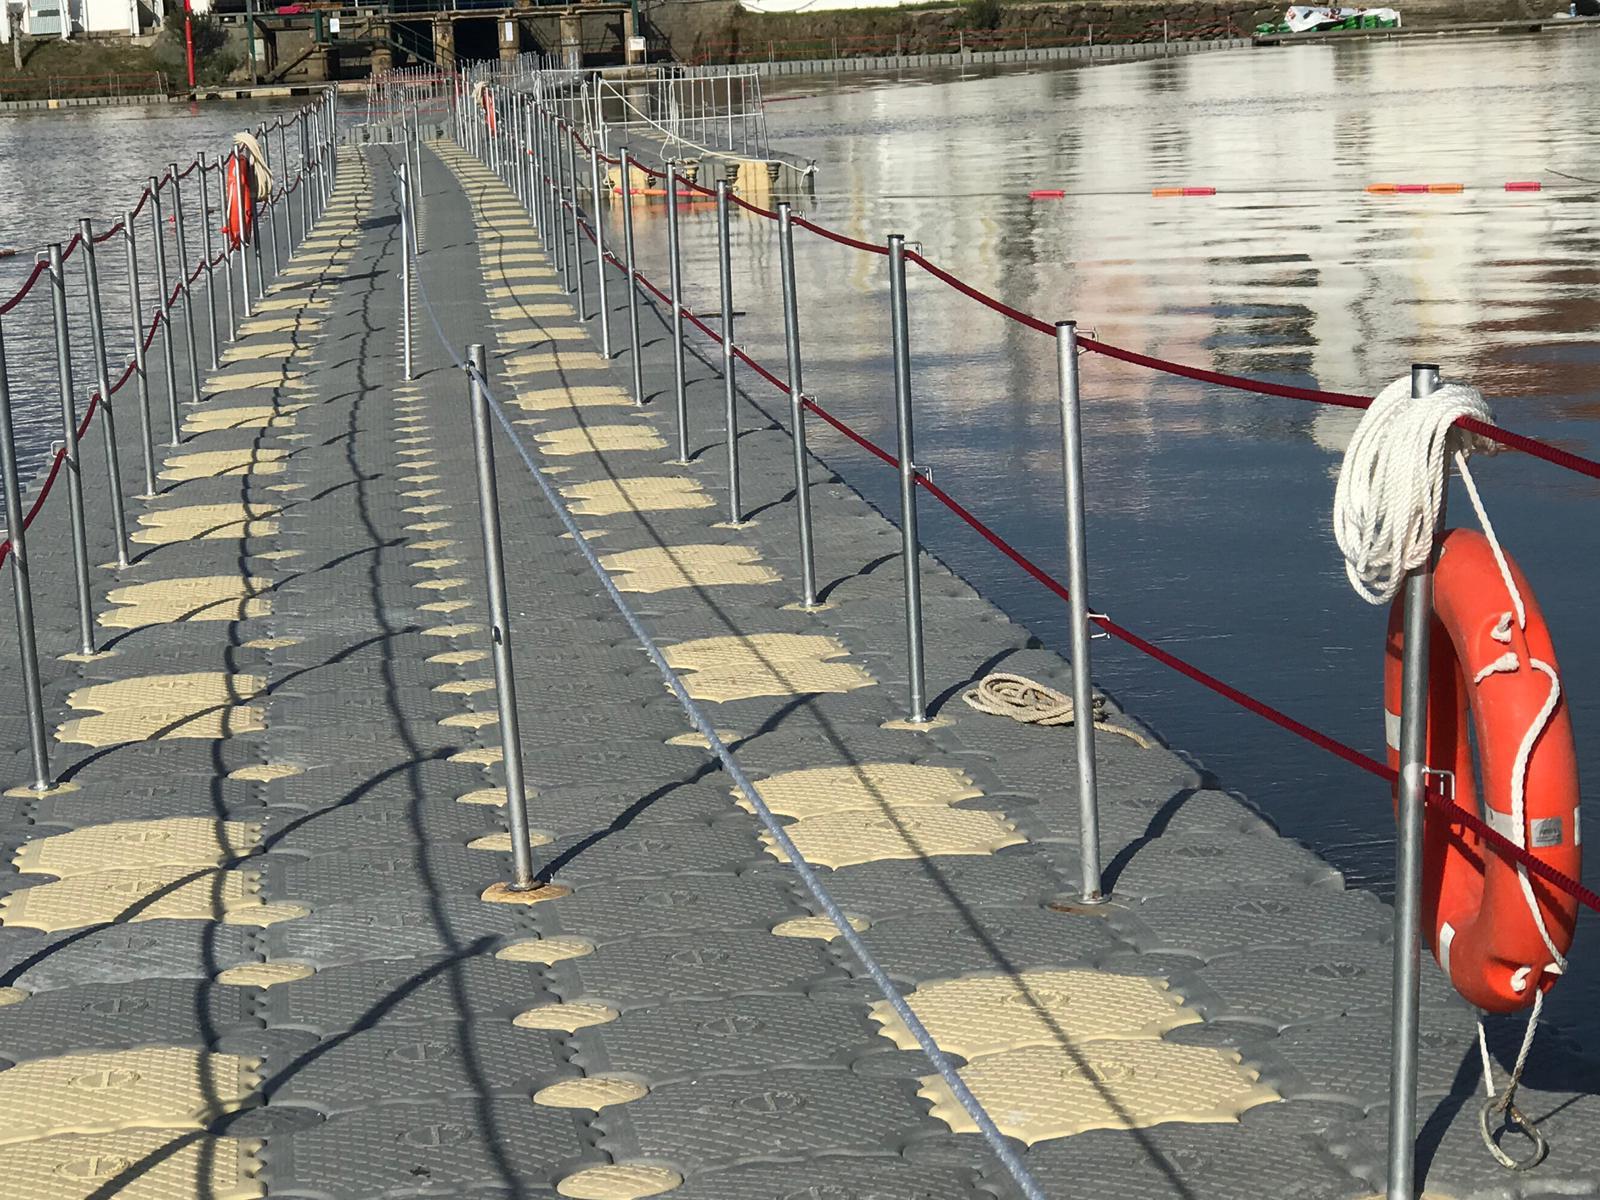 Puente-flotante-pasarela-flotante-feria-contrabando-Unibis10